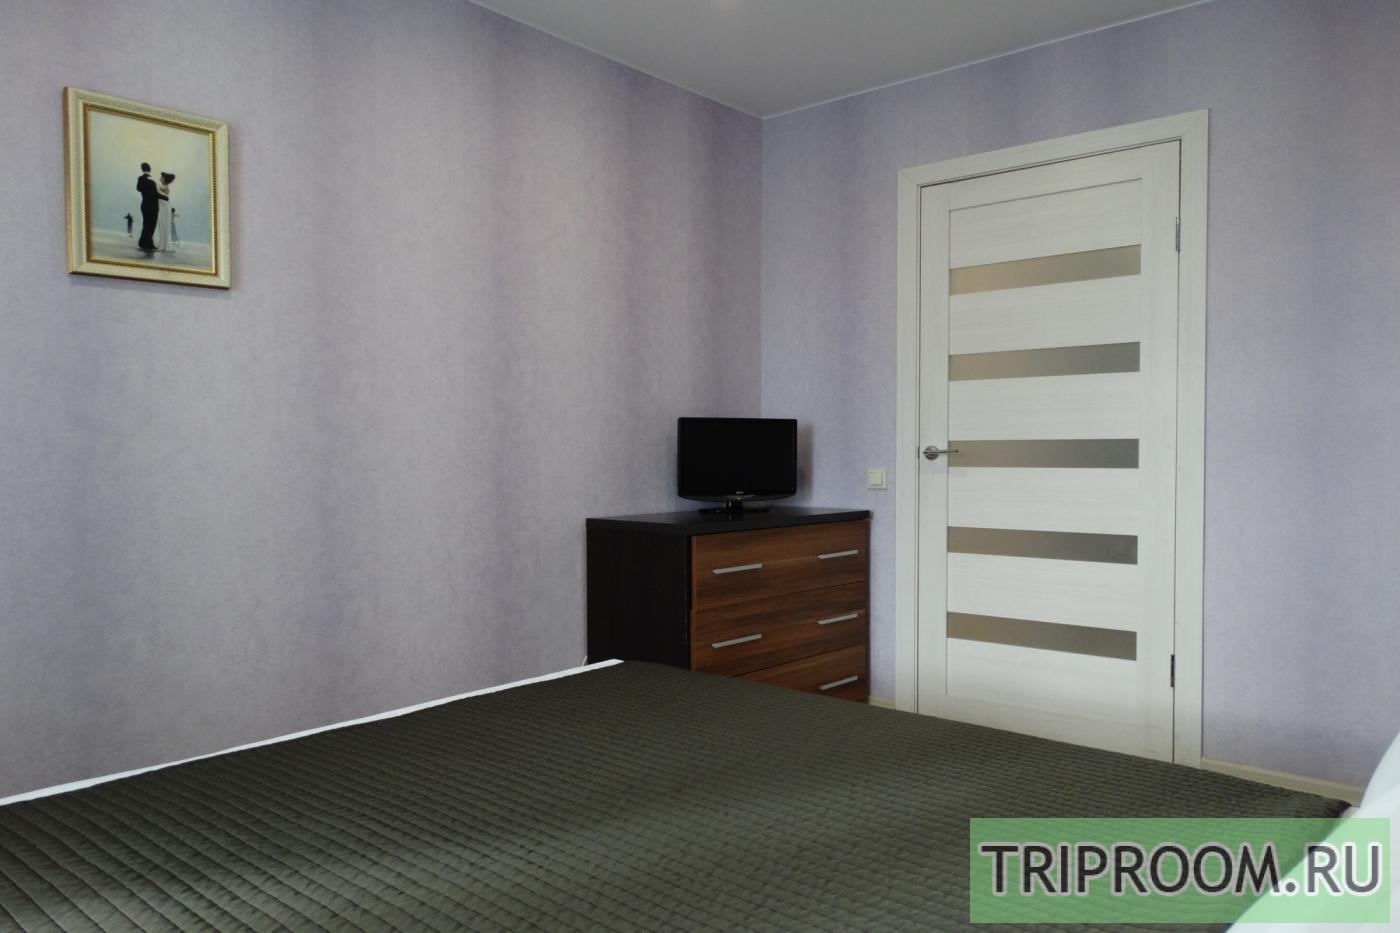 2-комнатная квартира посуточно (вариант № 19069), ул. Усачева улица, фото № 9